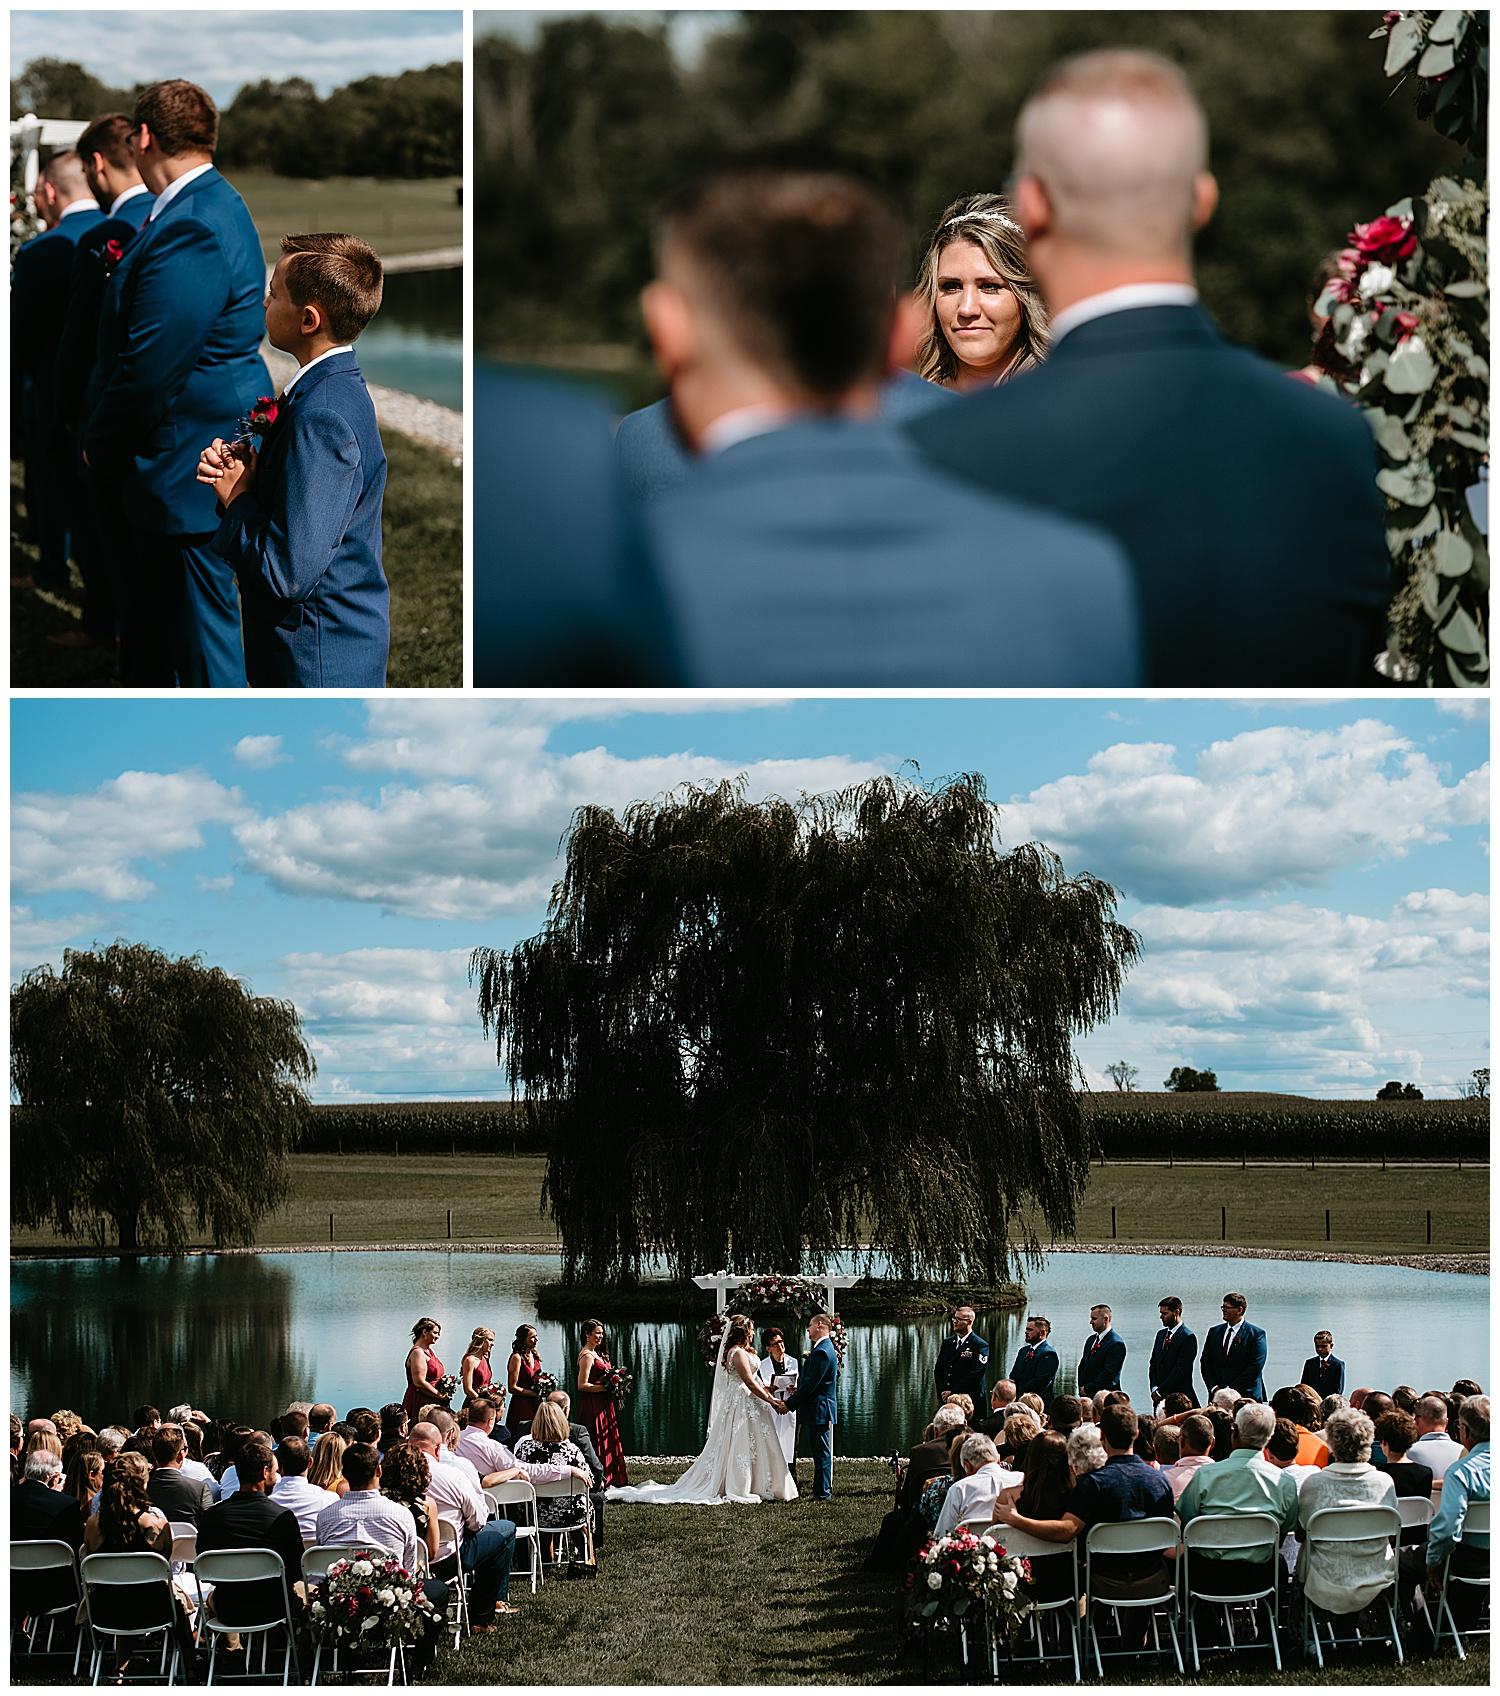 NEPA-Bloomgsburg-Wedding-Photographer-at-The-Barn-at-Greystone-Farms-Watsontown-PA_0069.jpg